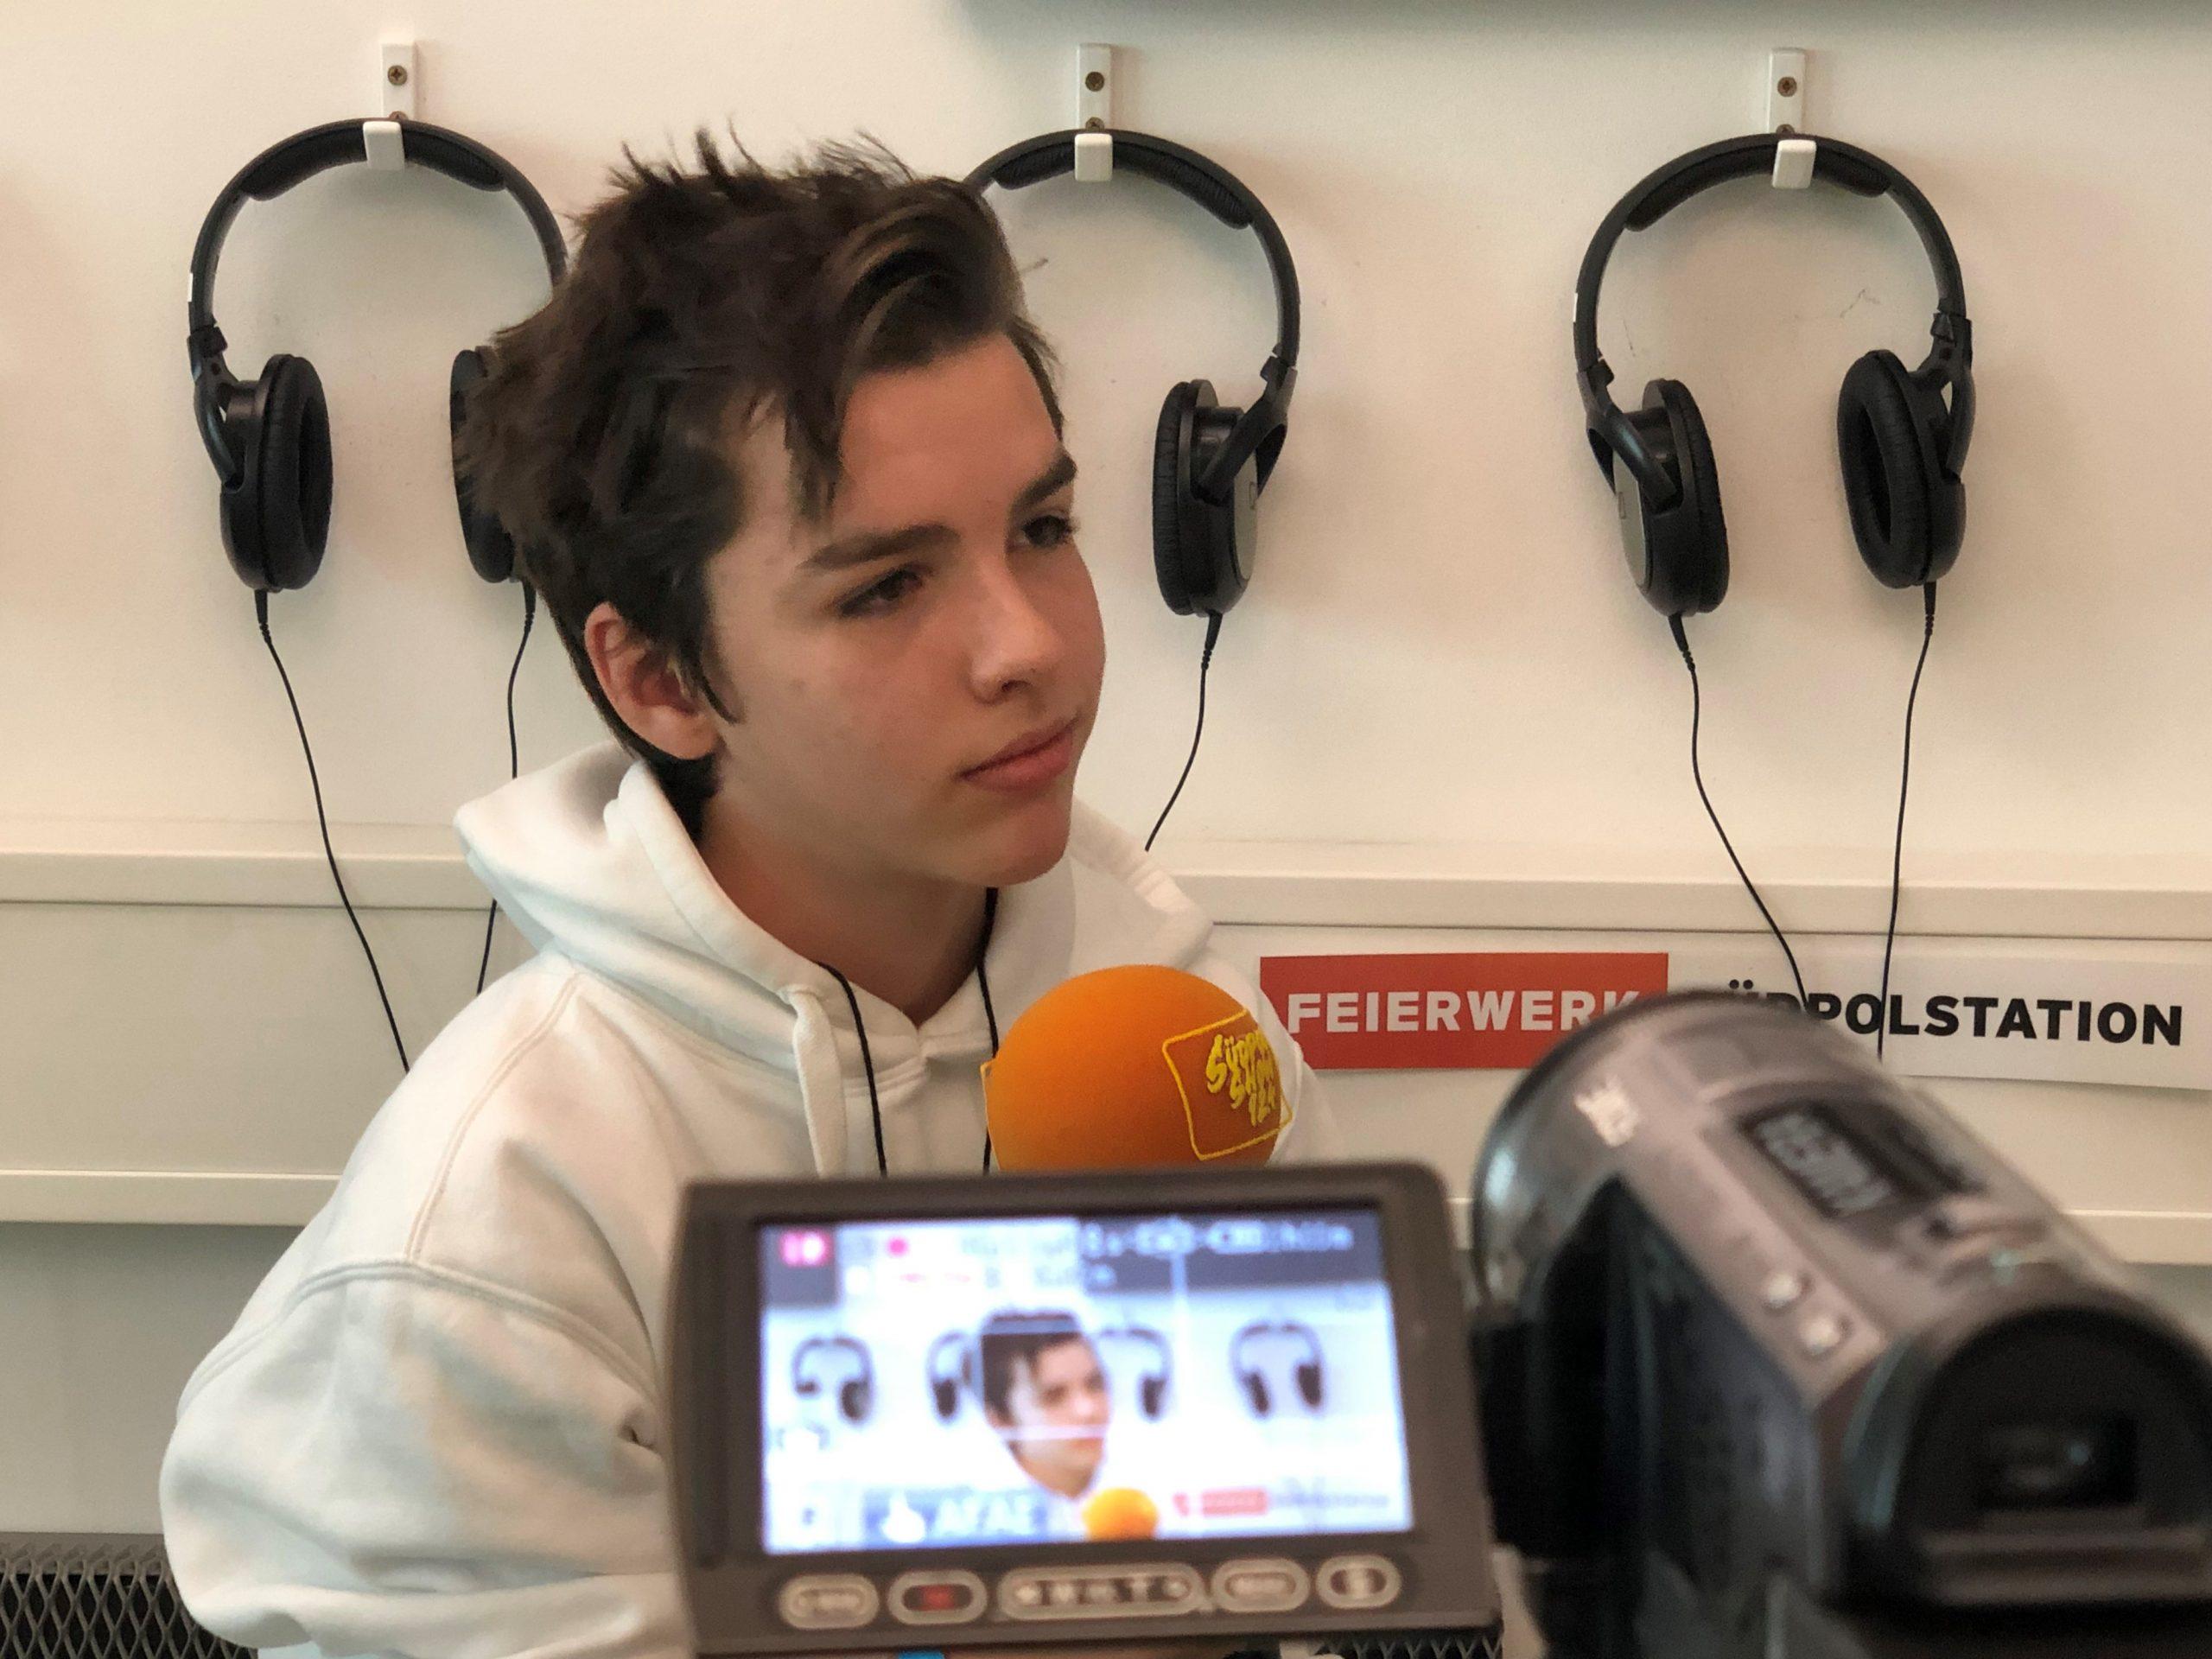 Feierwerk_Südpolstation_Kinder-Jugendradio_Südpolshow_Matteo_Miska